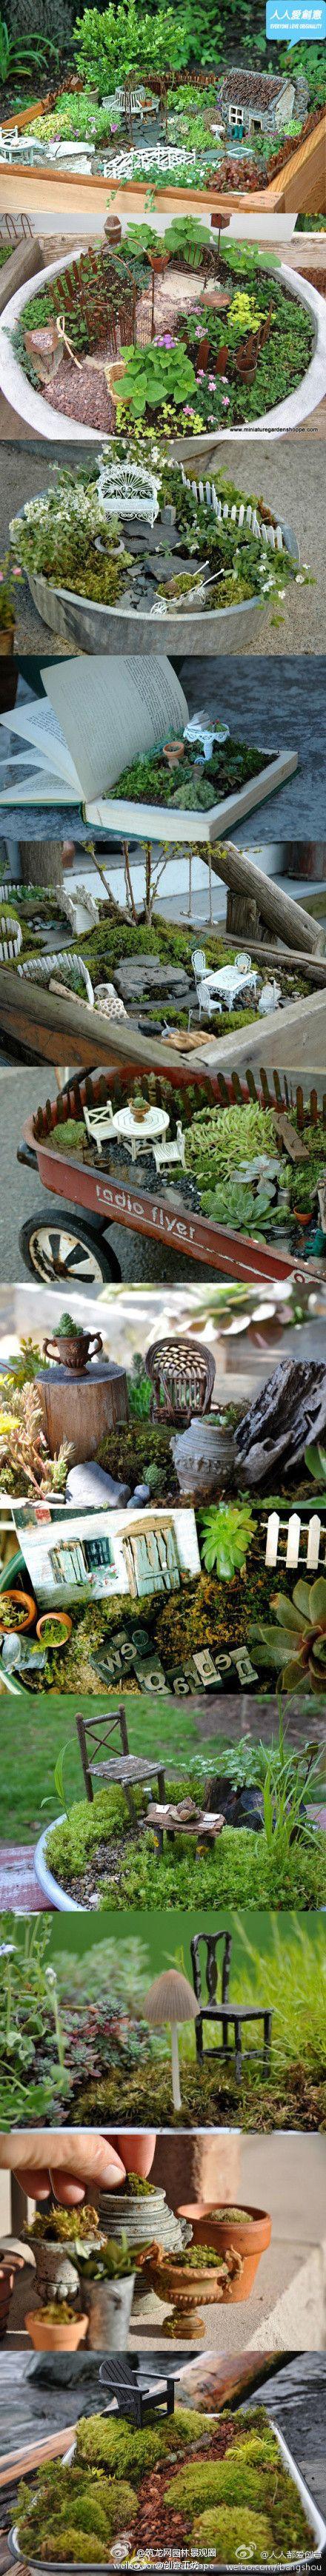 Sweet lil' fairy gardens